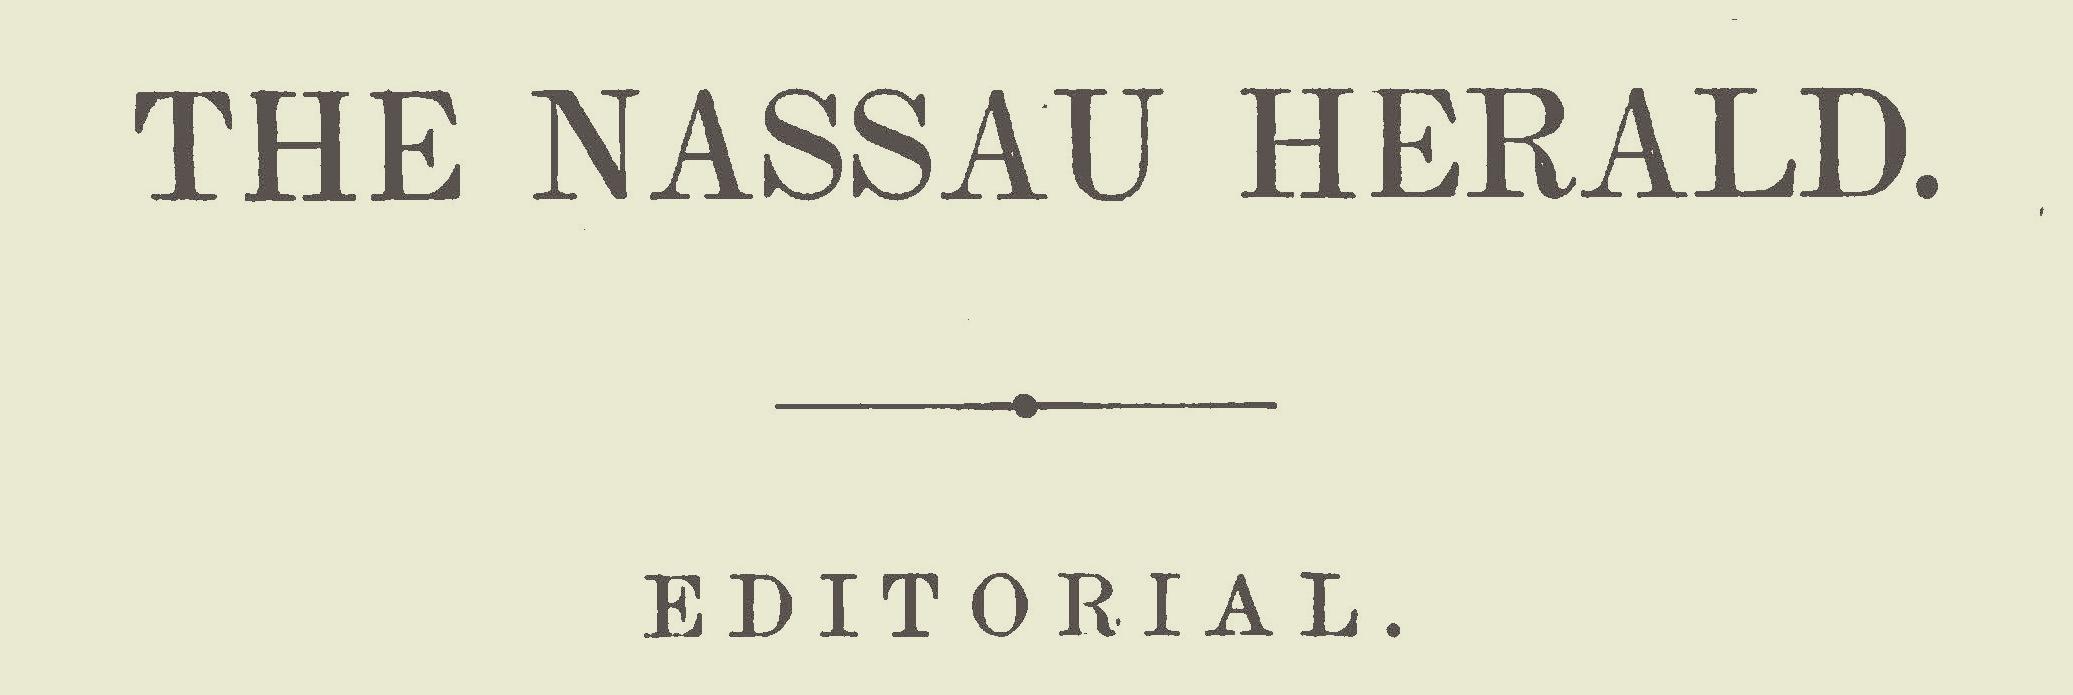 Warfield, Benjamin Breckinridge, 1871 Editorial Title Page.jpg